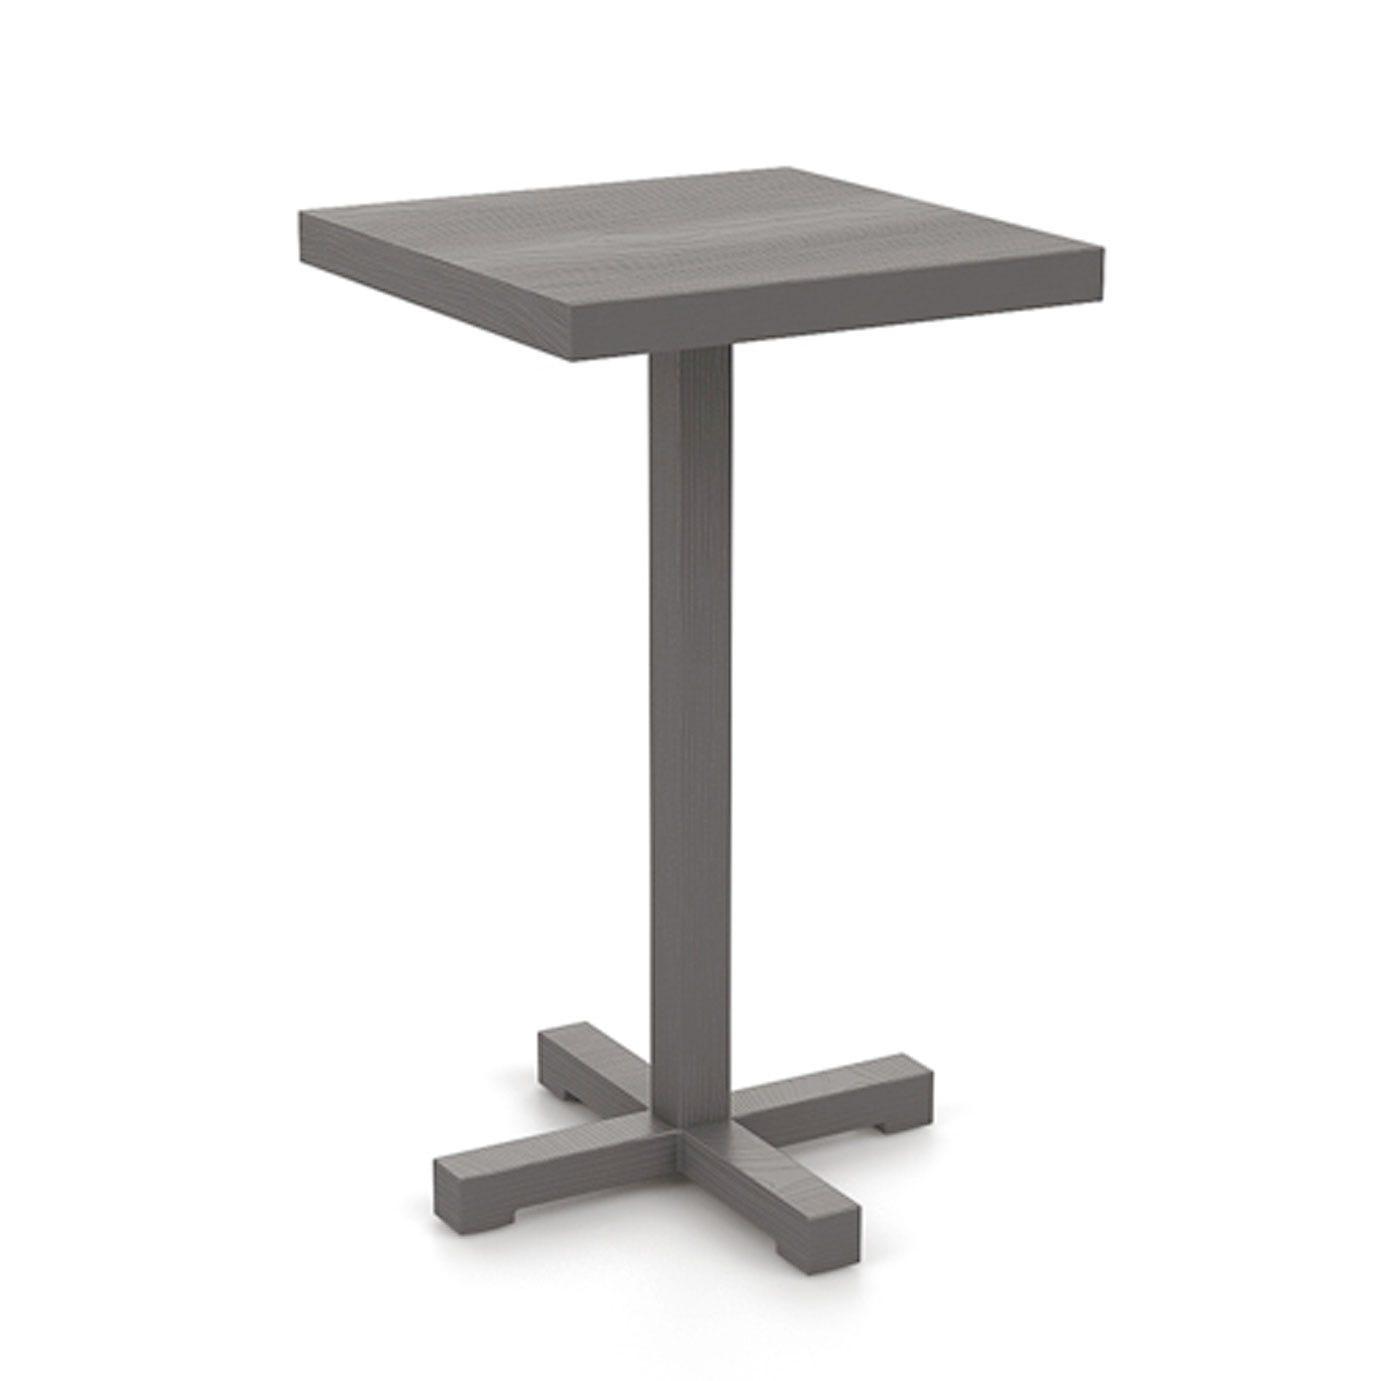 Bar table dimensions - Bar Table Dimensions 24